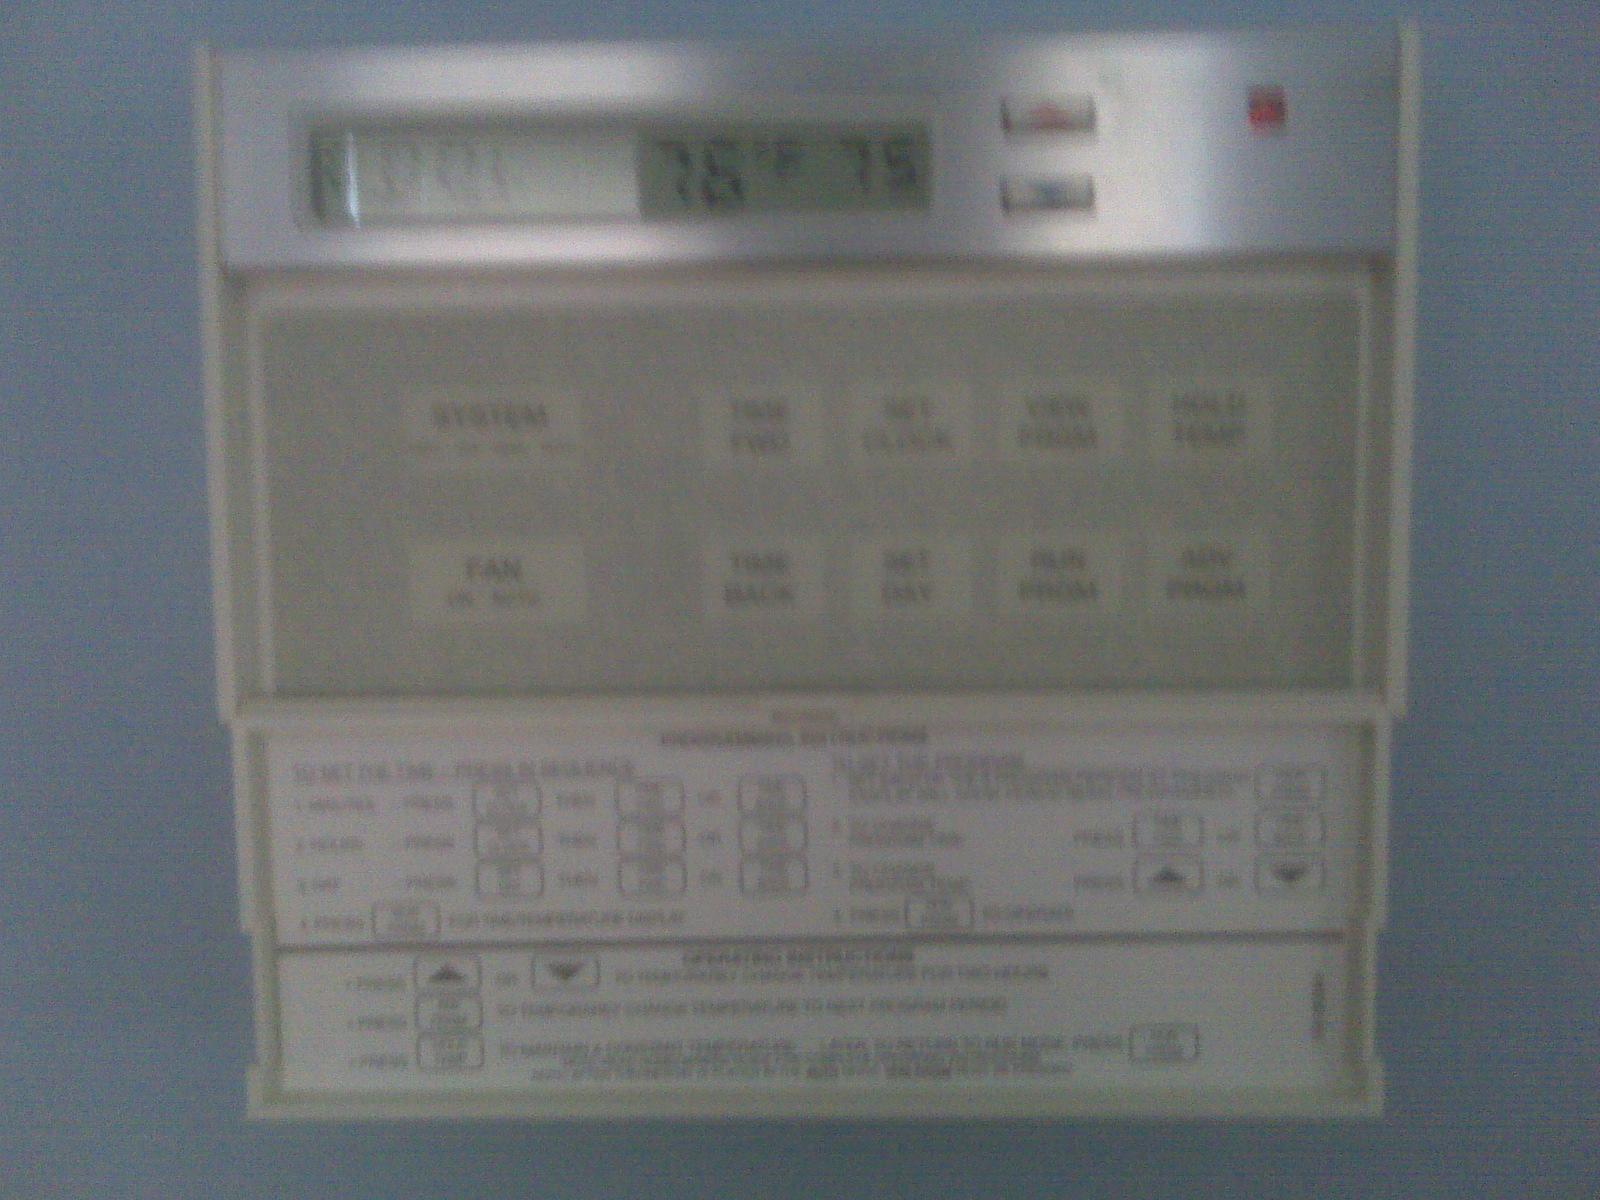 lennox ac thermostat. programmable thermostat lennox ac